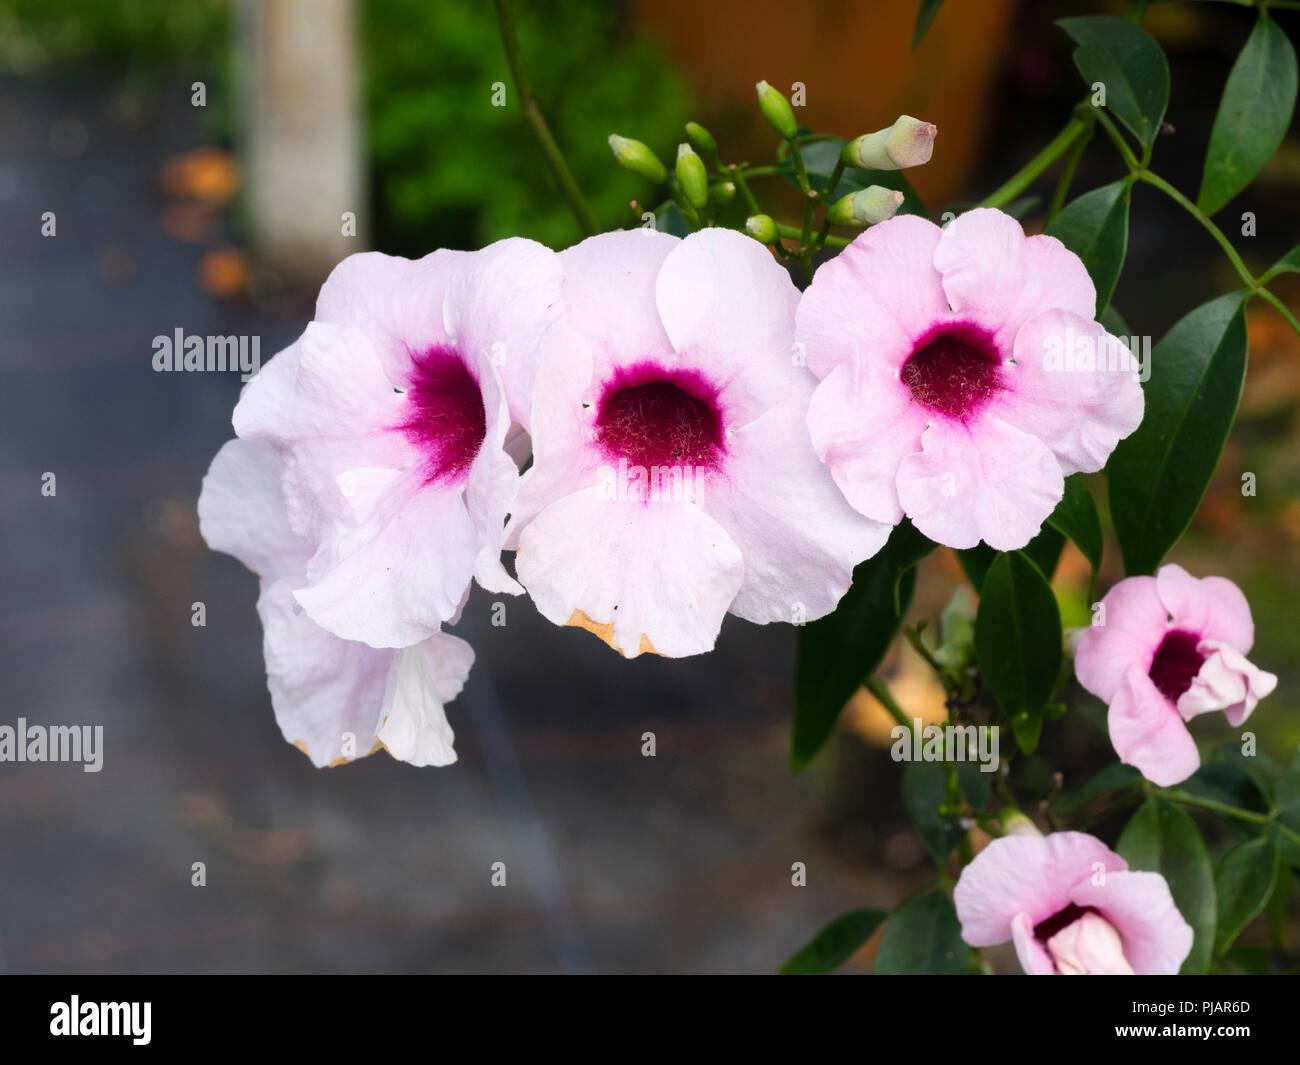 Red throated white flowers of the tender Australian climber, Pandorea jasminoides - Stock Image